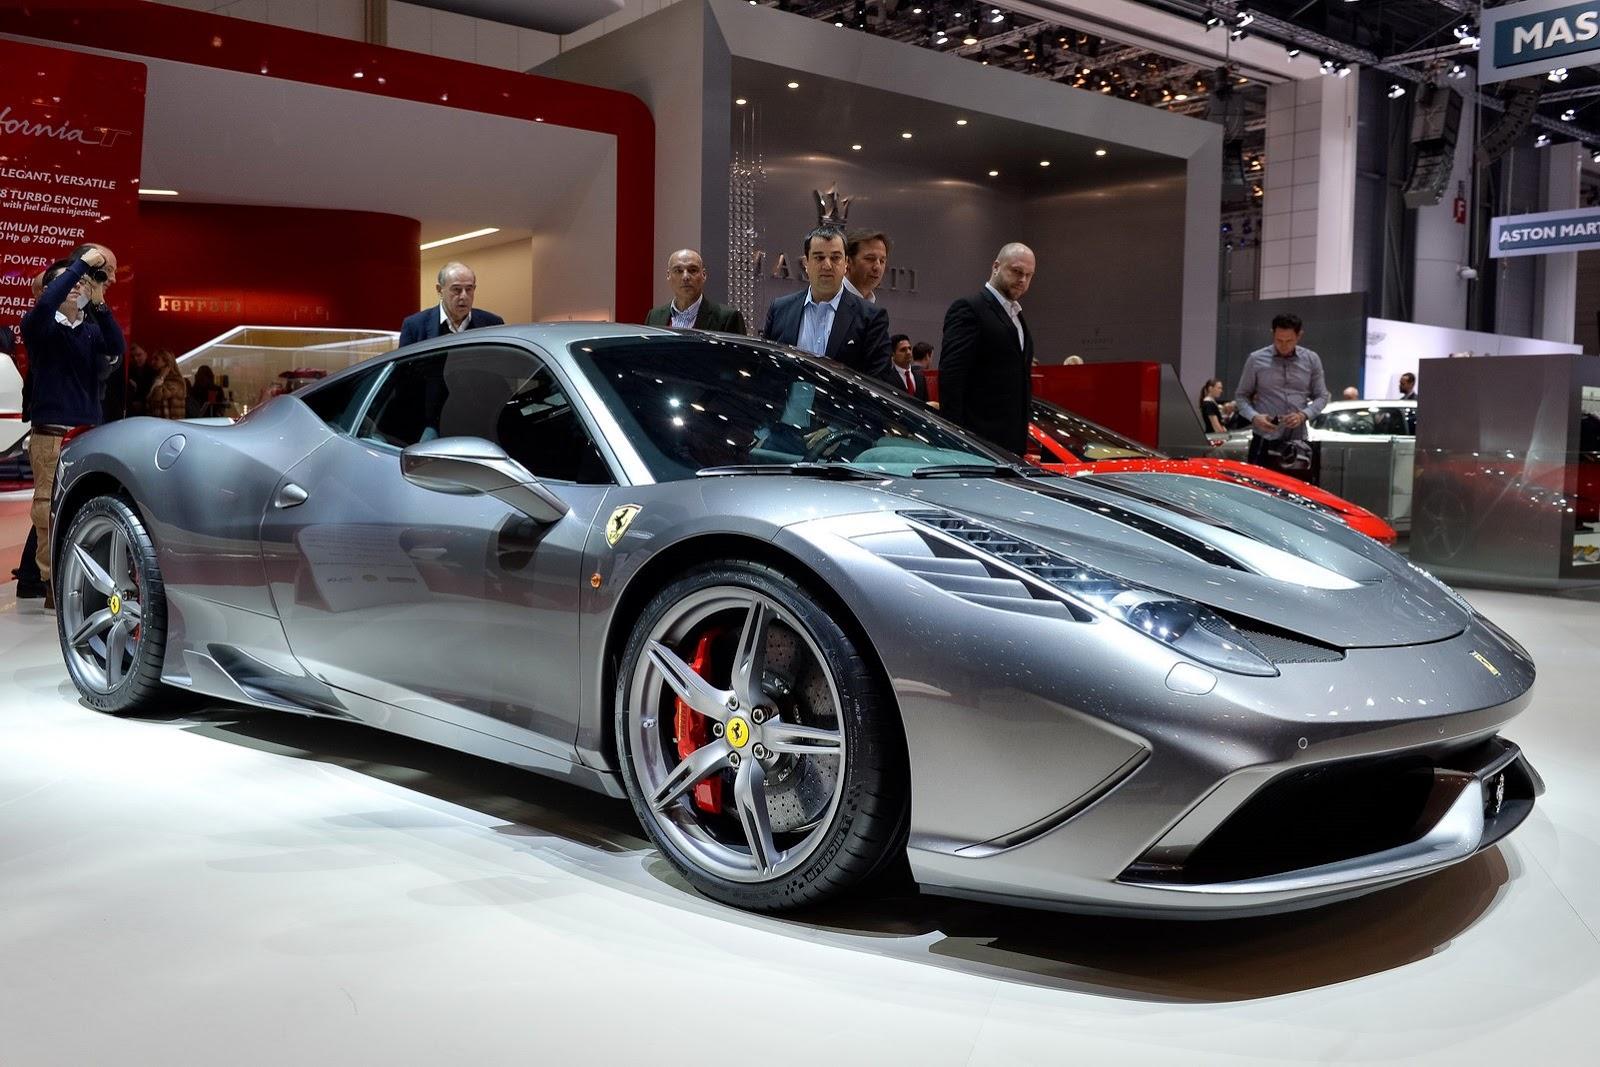 http://lh3.ggpht.com/-TNpInzRJZck/Uxc4rPgHrTI/AAAAAAAQVXc/FFKkOP-Gqss/s1600/Ferrari-458-Speciale-1%25255B2%25255D.jpg